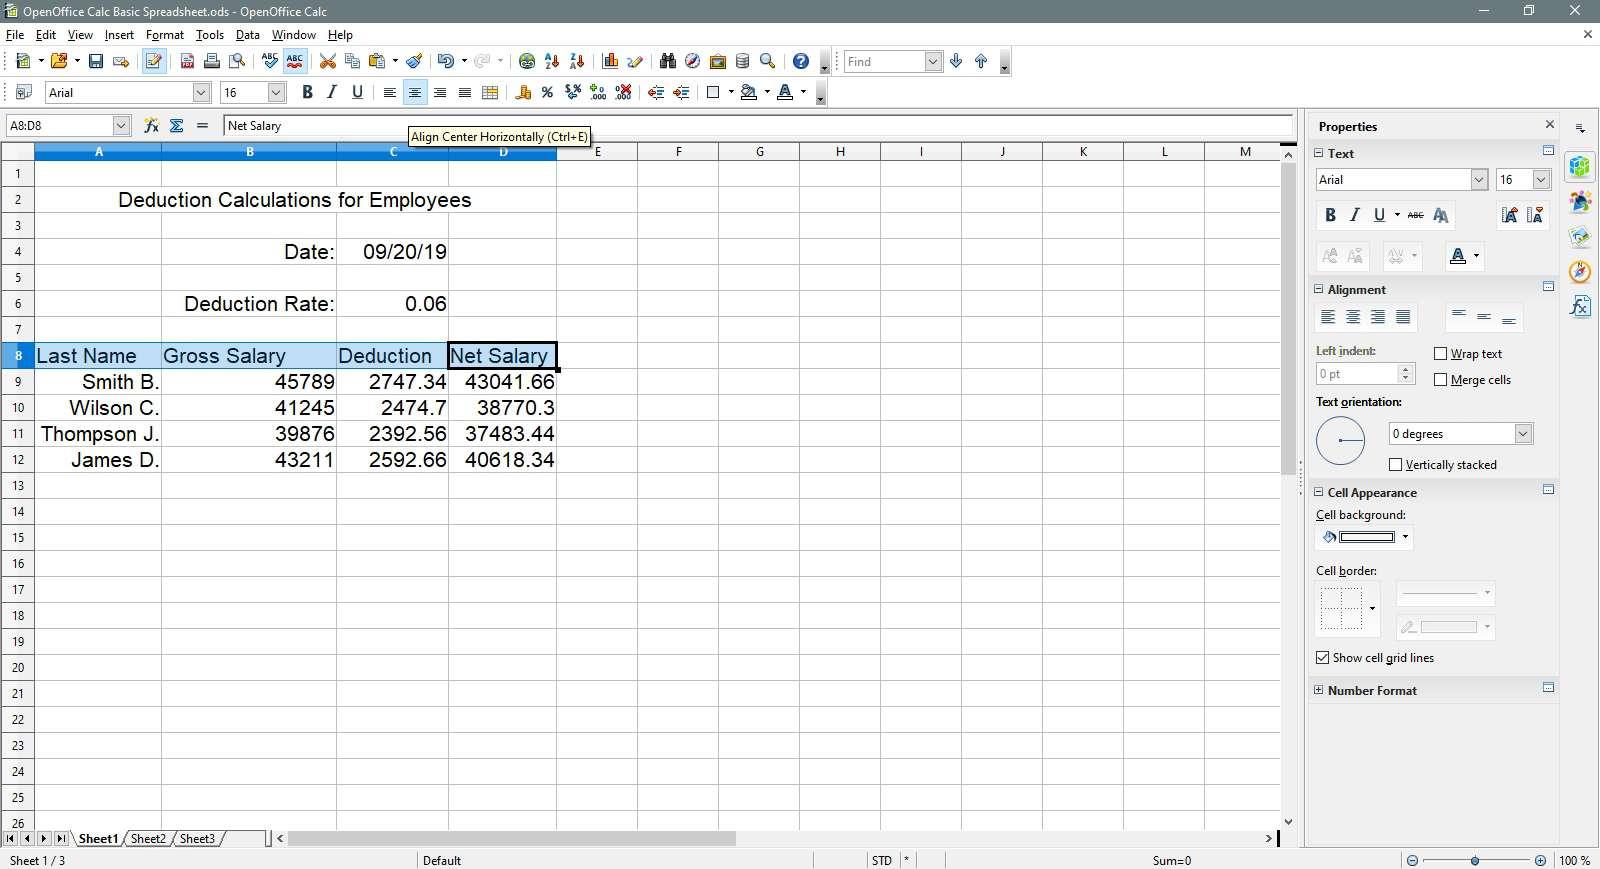 Open Office Calc Basic Spreadsheet Tutorial